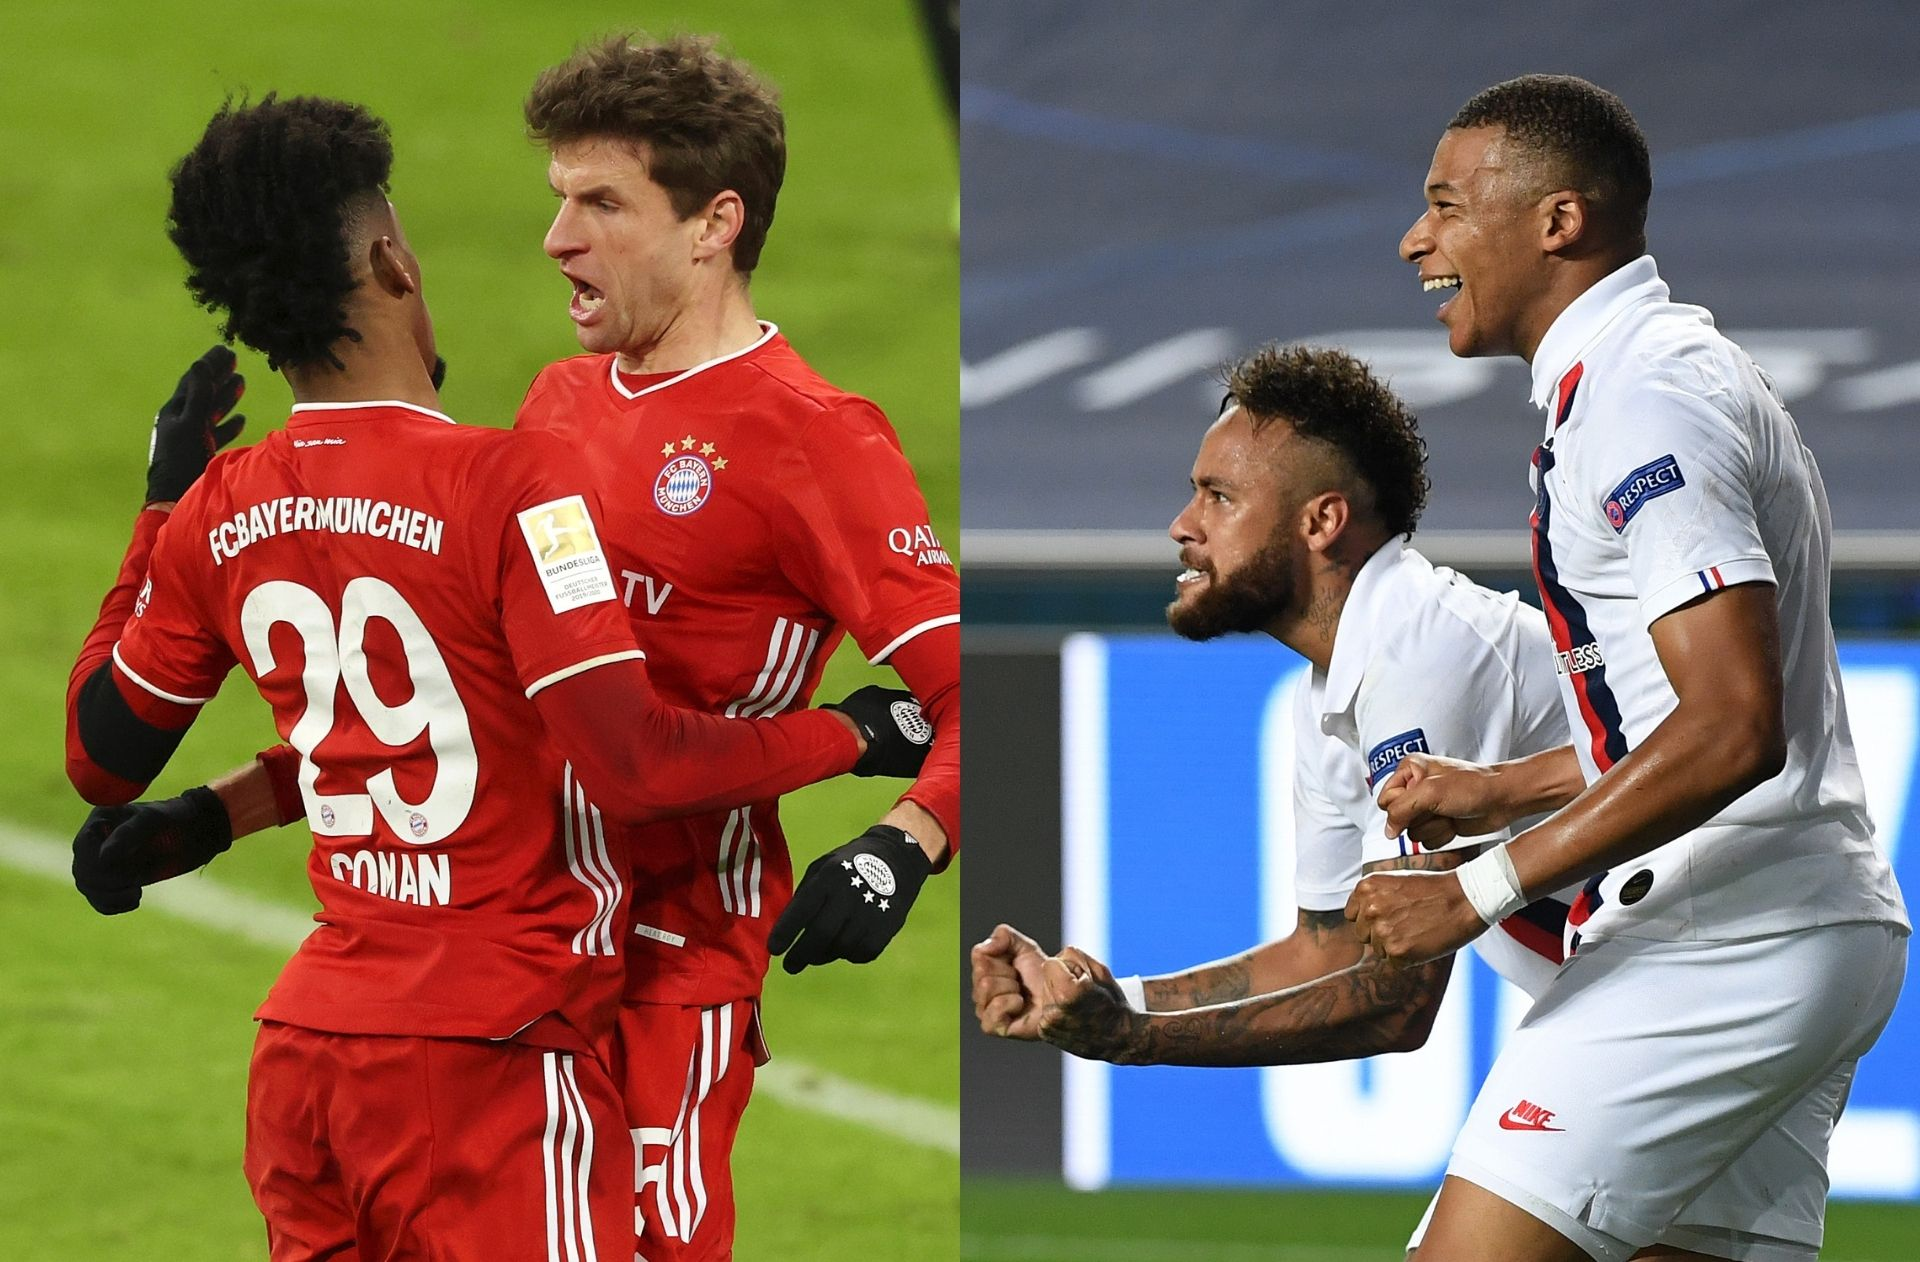 Bayern Munich vs Paris Saint-Germain - Champions League